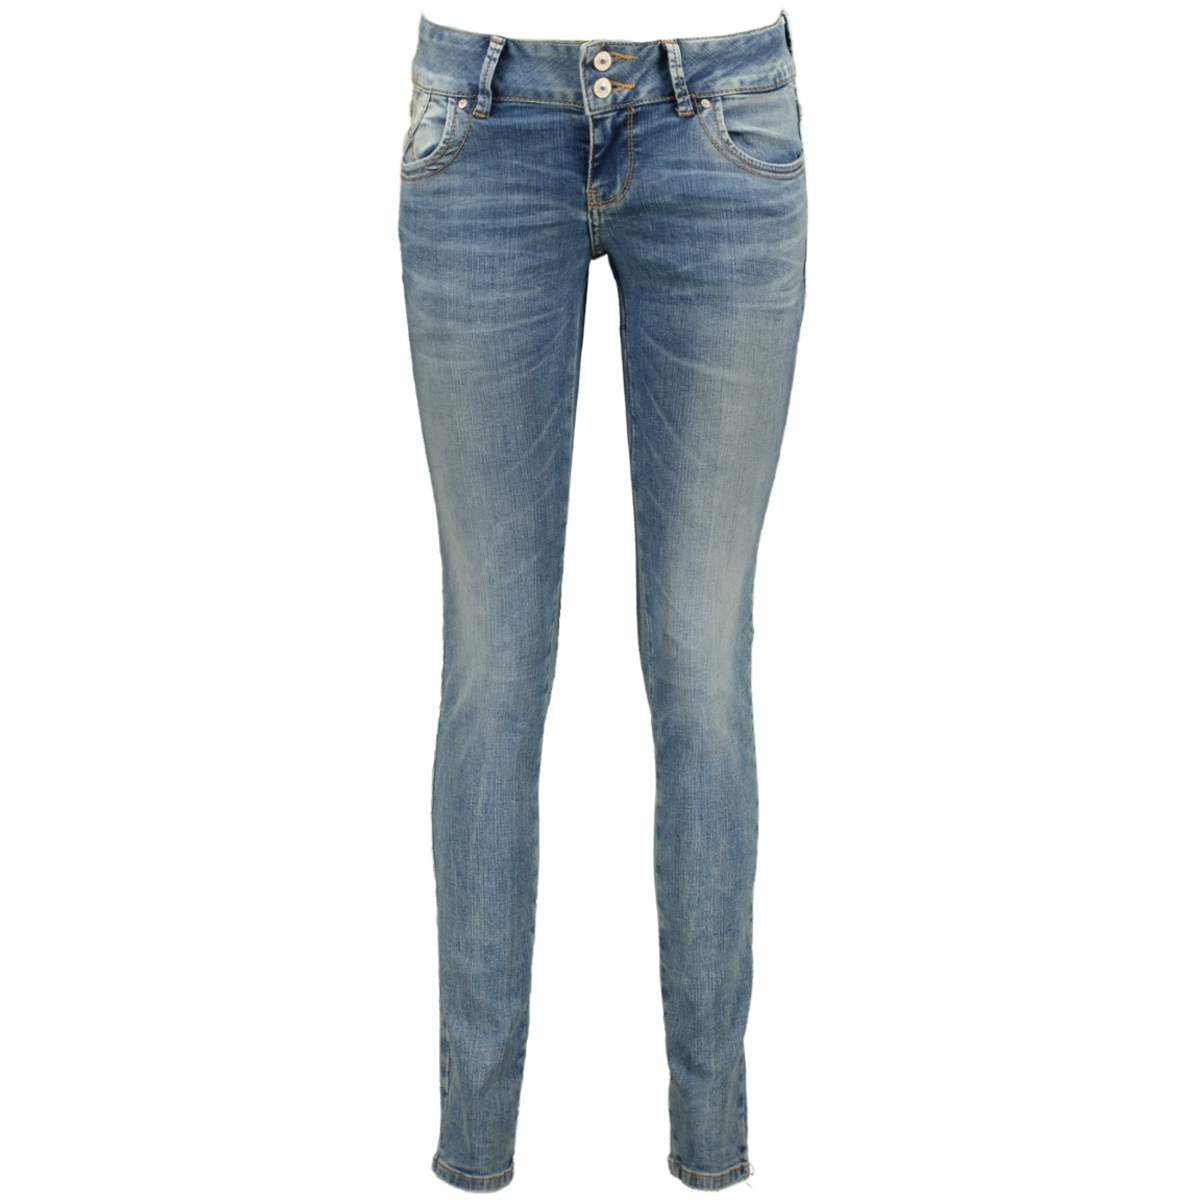 10095065.13349 molly ltb jeans savannah wash 51571